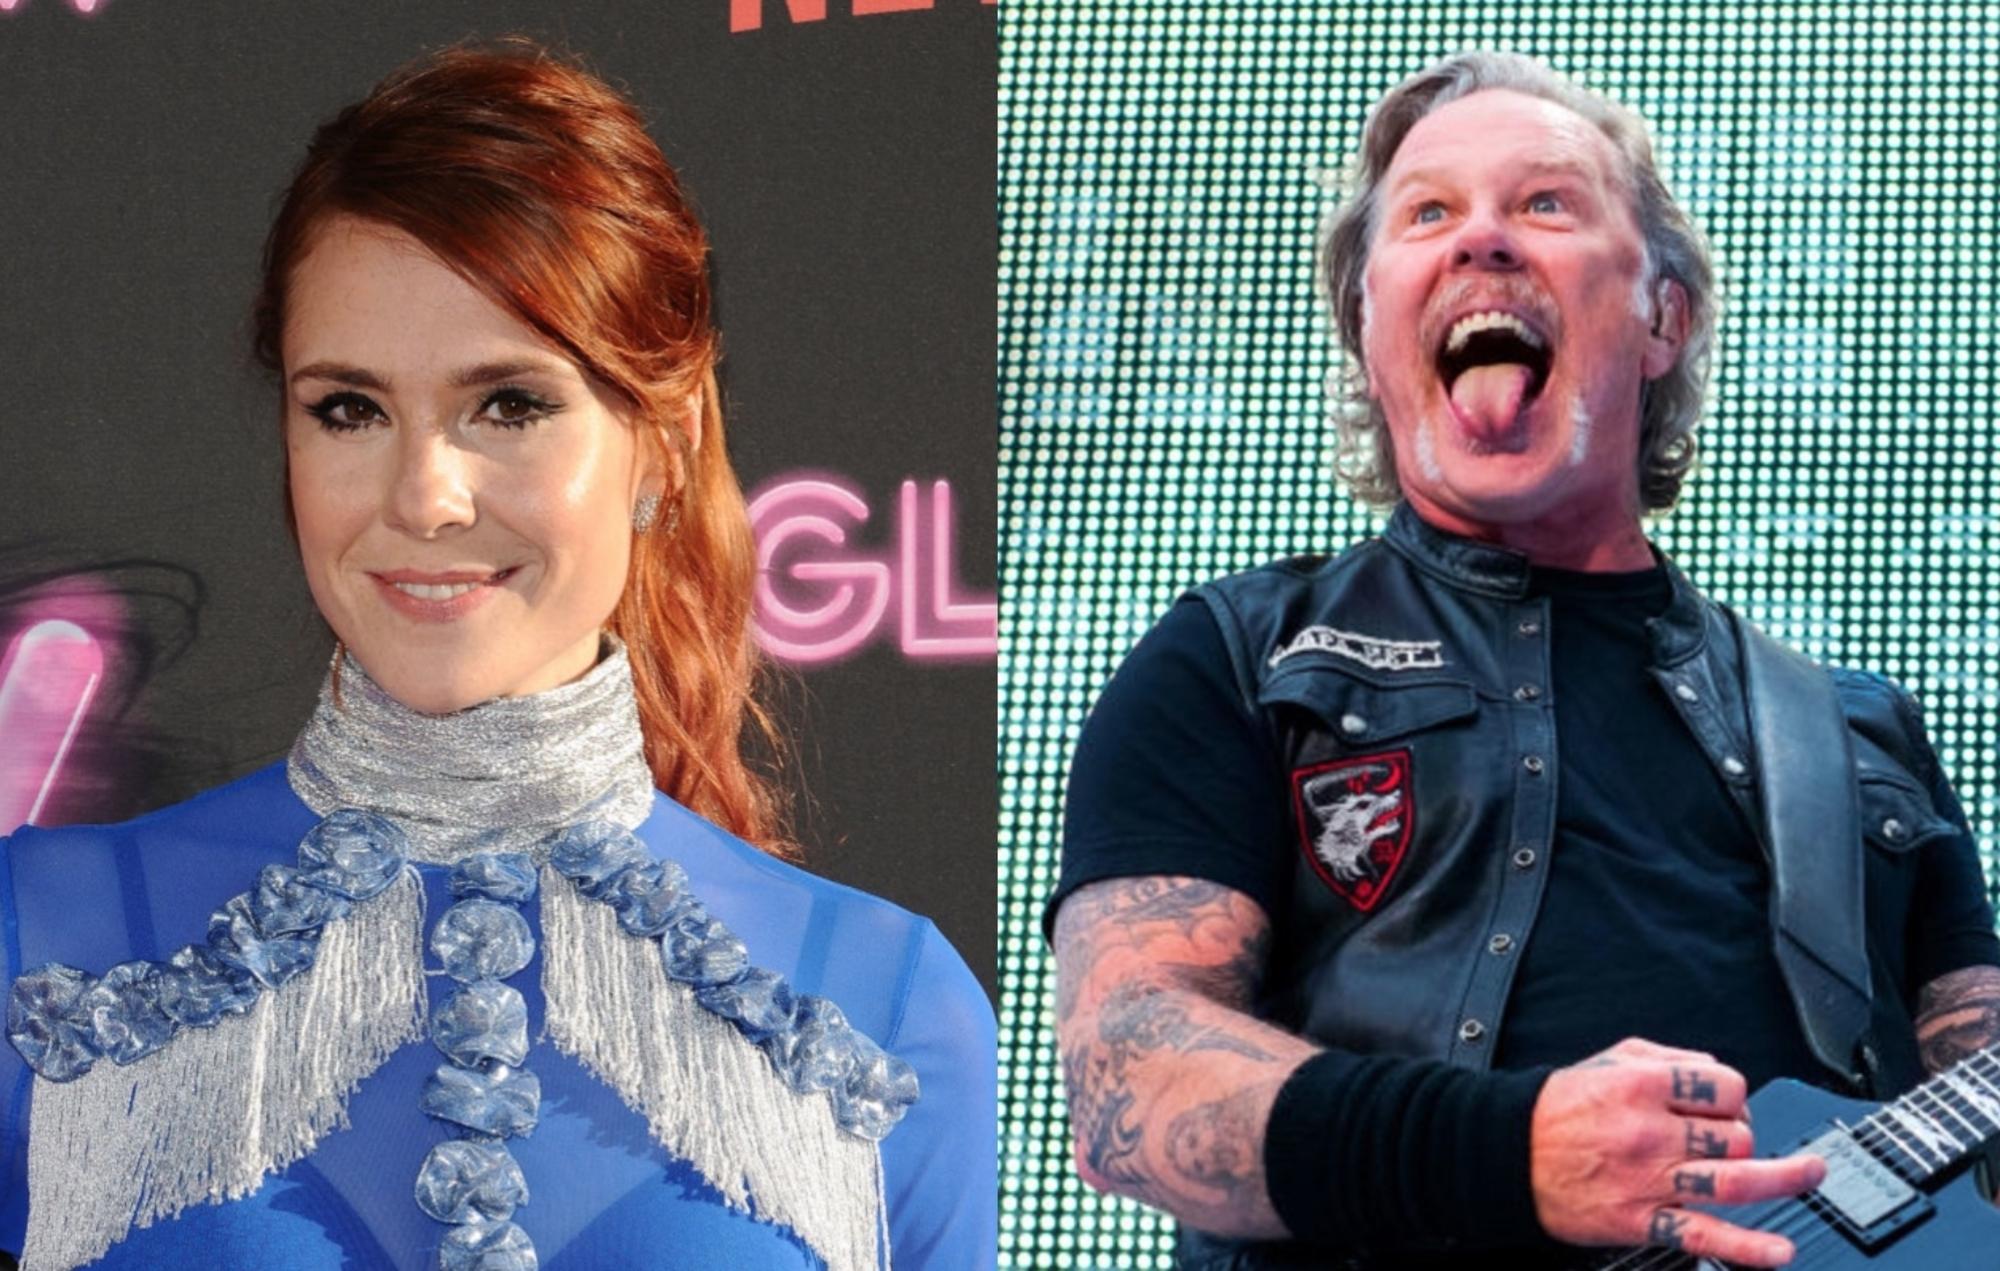 Watch Kate Nash play Metallica's 'Enter Sandman' on a penny whistle - EpicNews